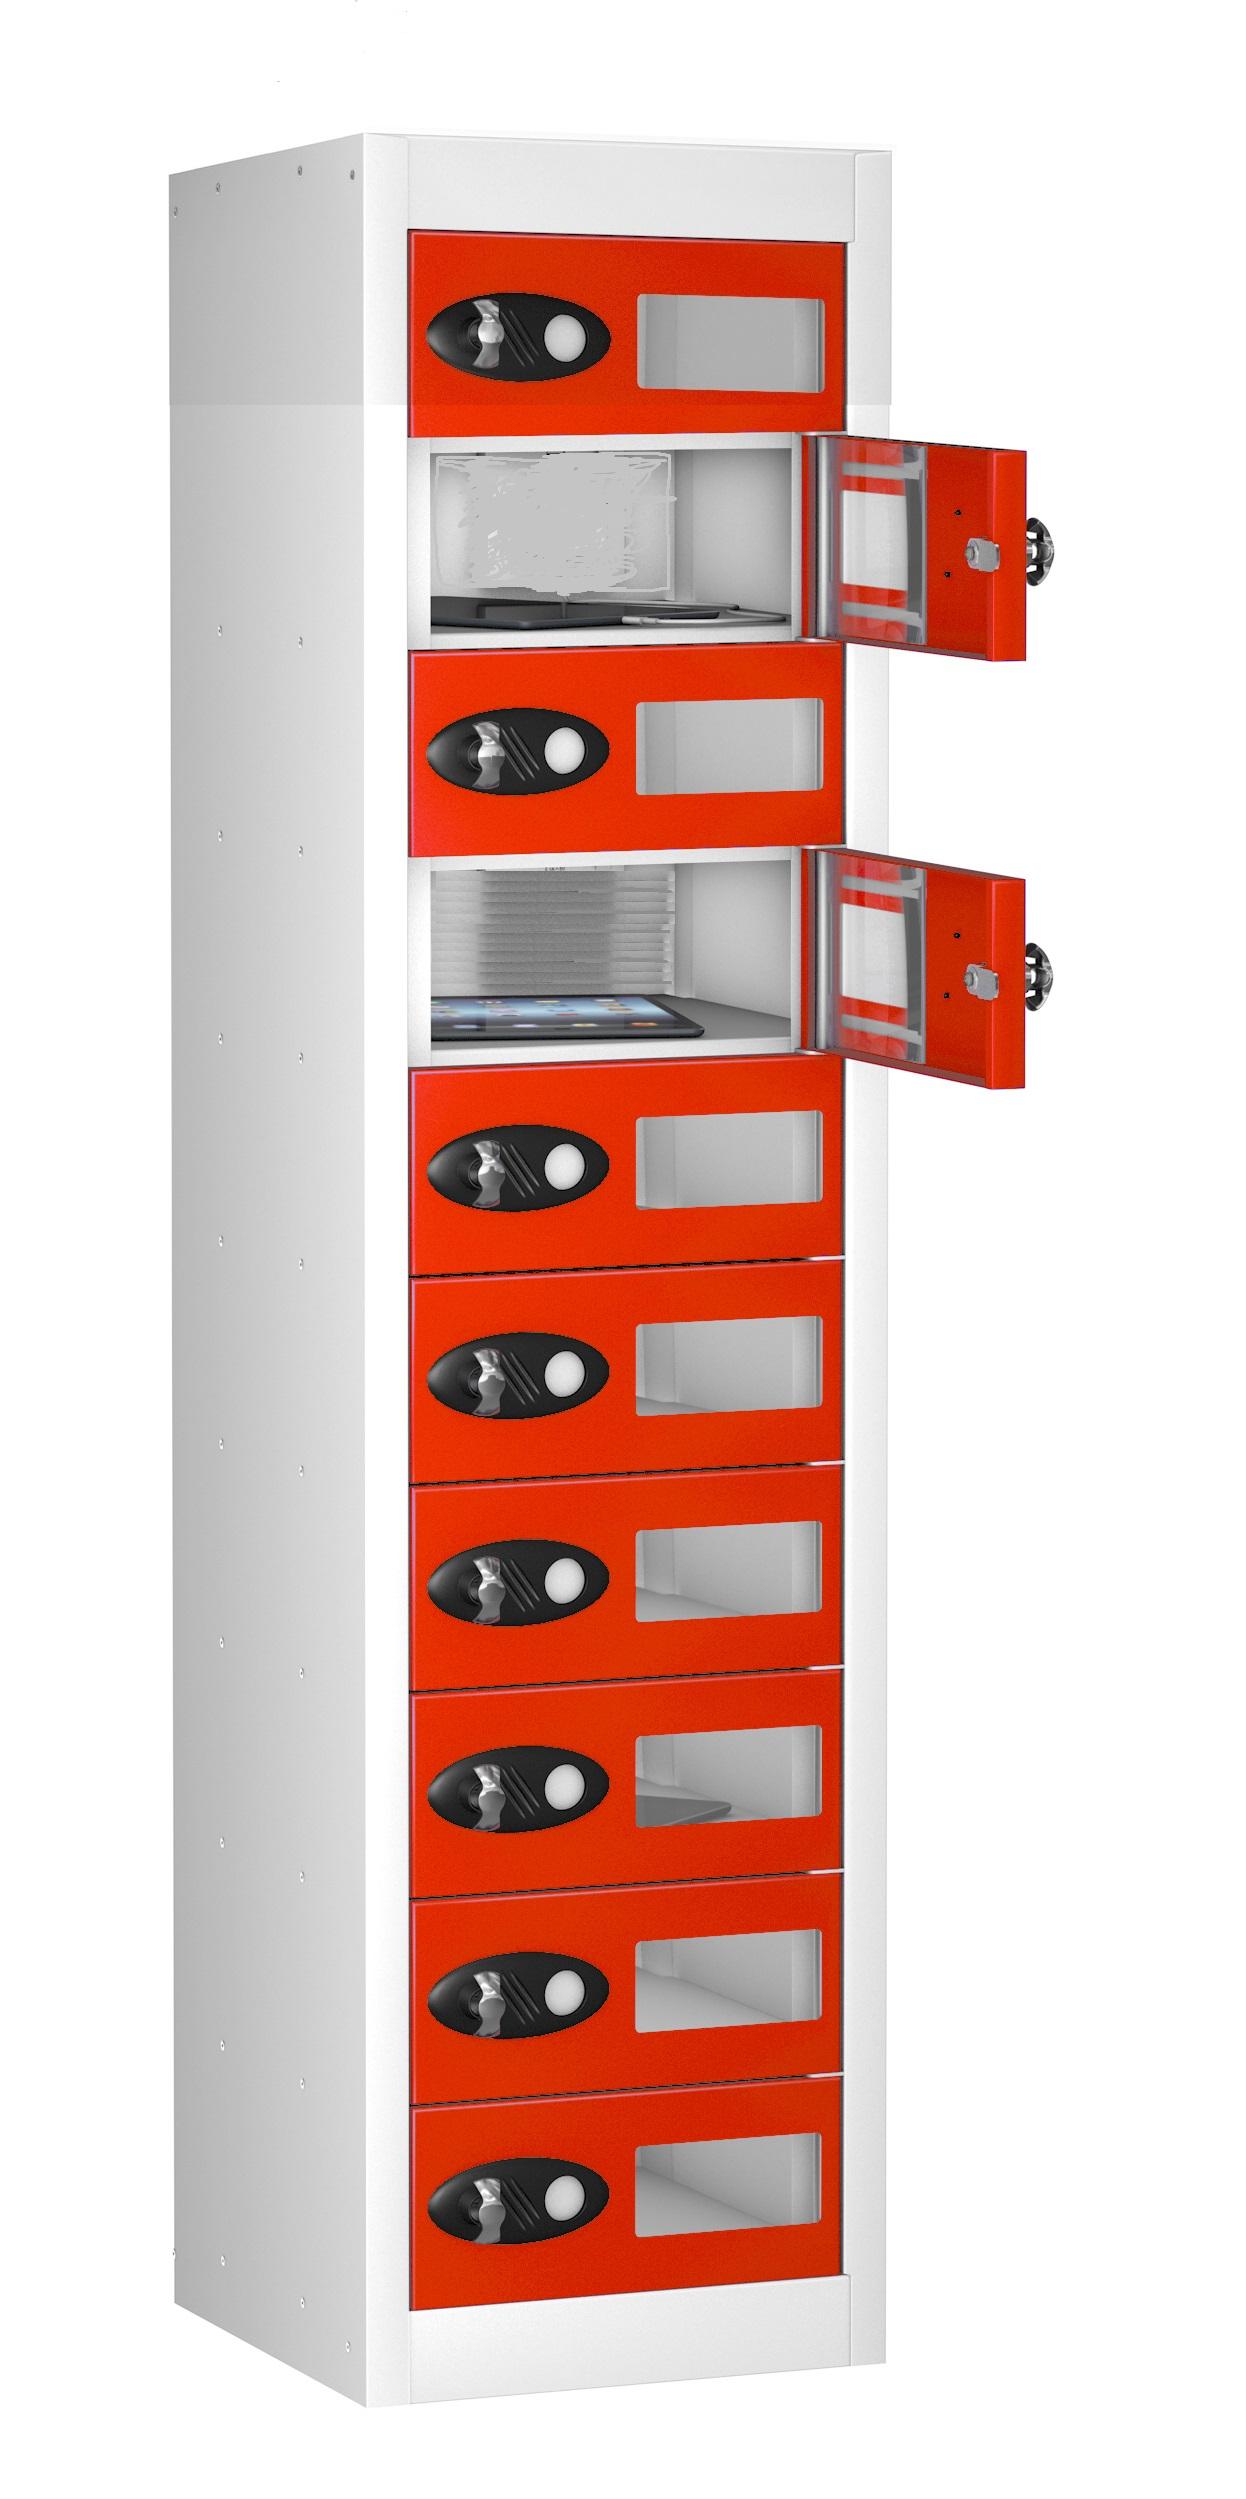 VISION PANEL Mobile Phone Storage Locker -10 Doors (Non Charging)